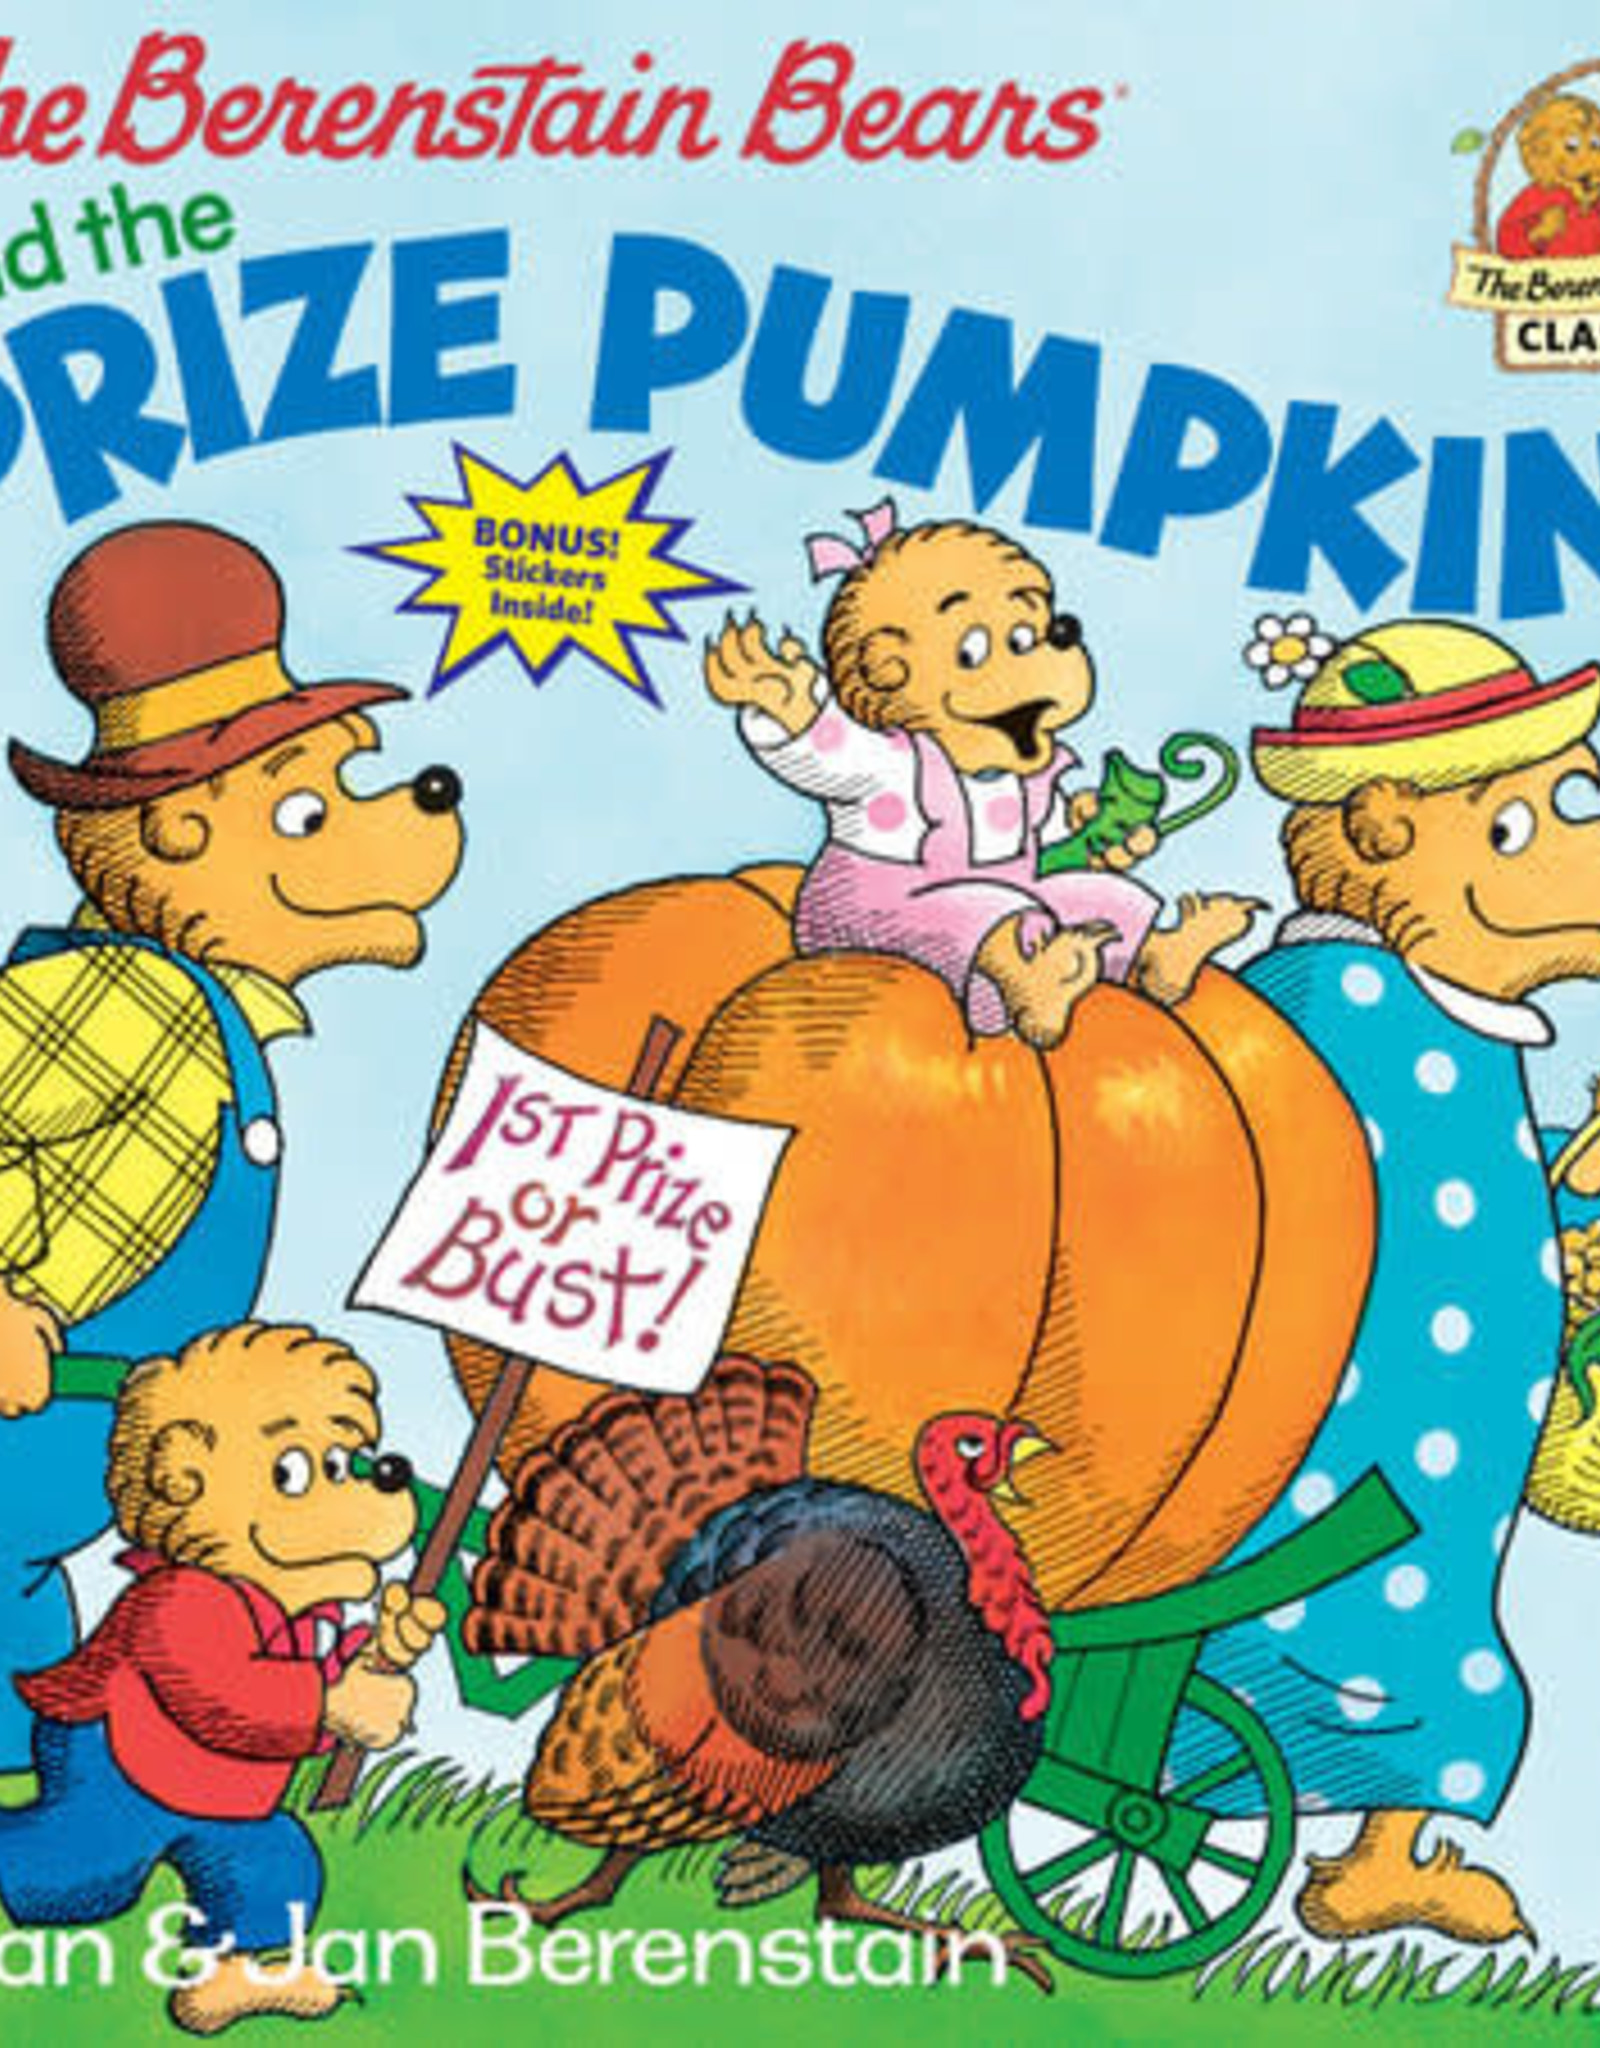 Berenstain Bears Prize Pumpkin